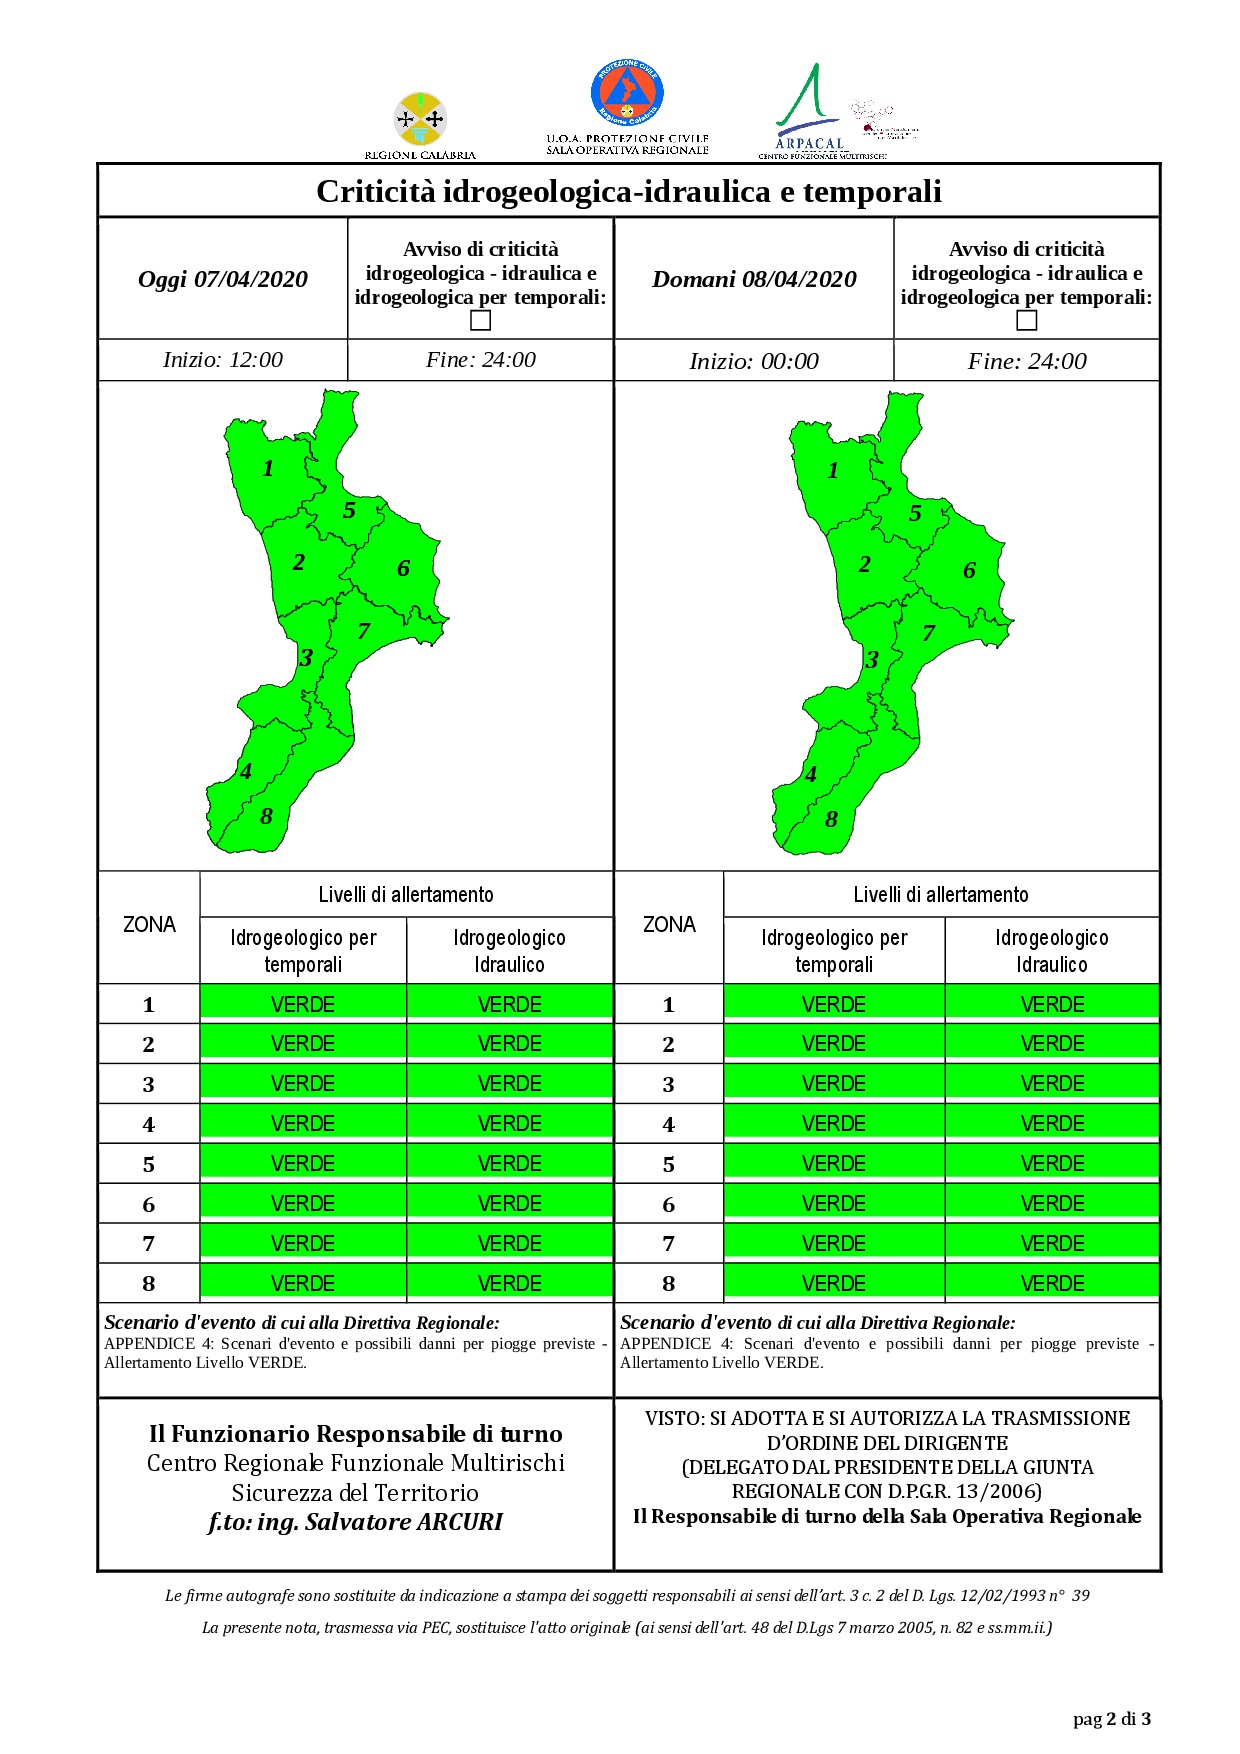 Criticità idrogeologica-idraulica e temporali in Calabria 07-04-2020